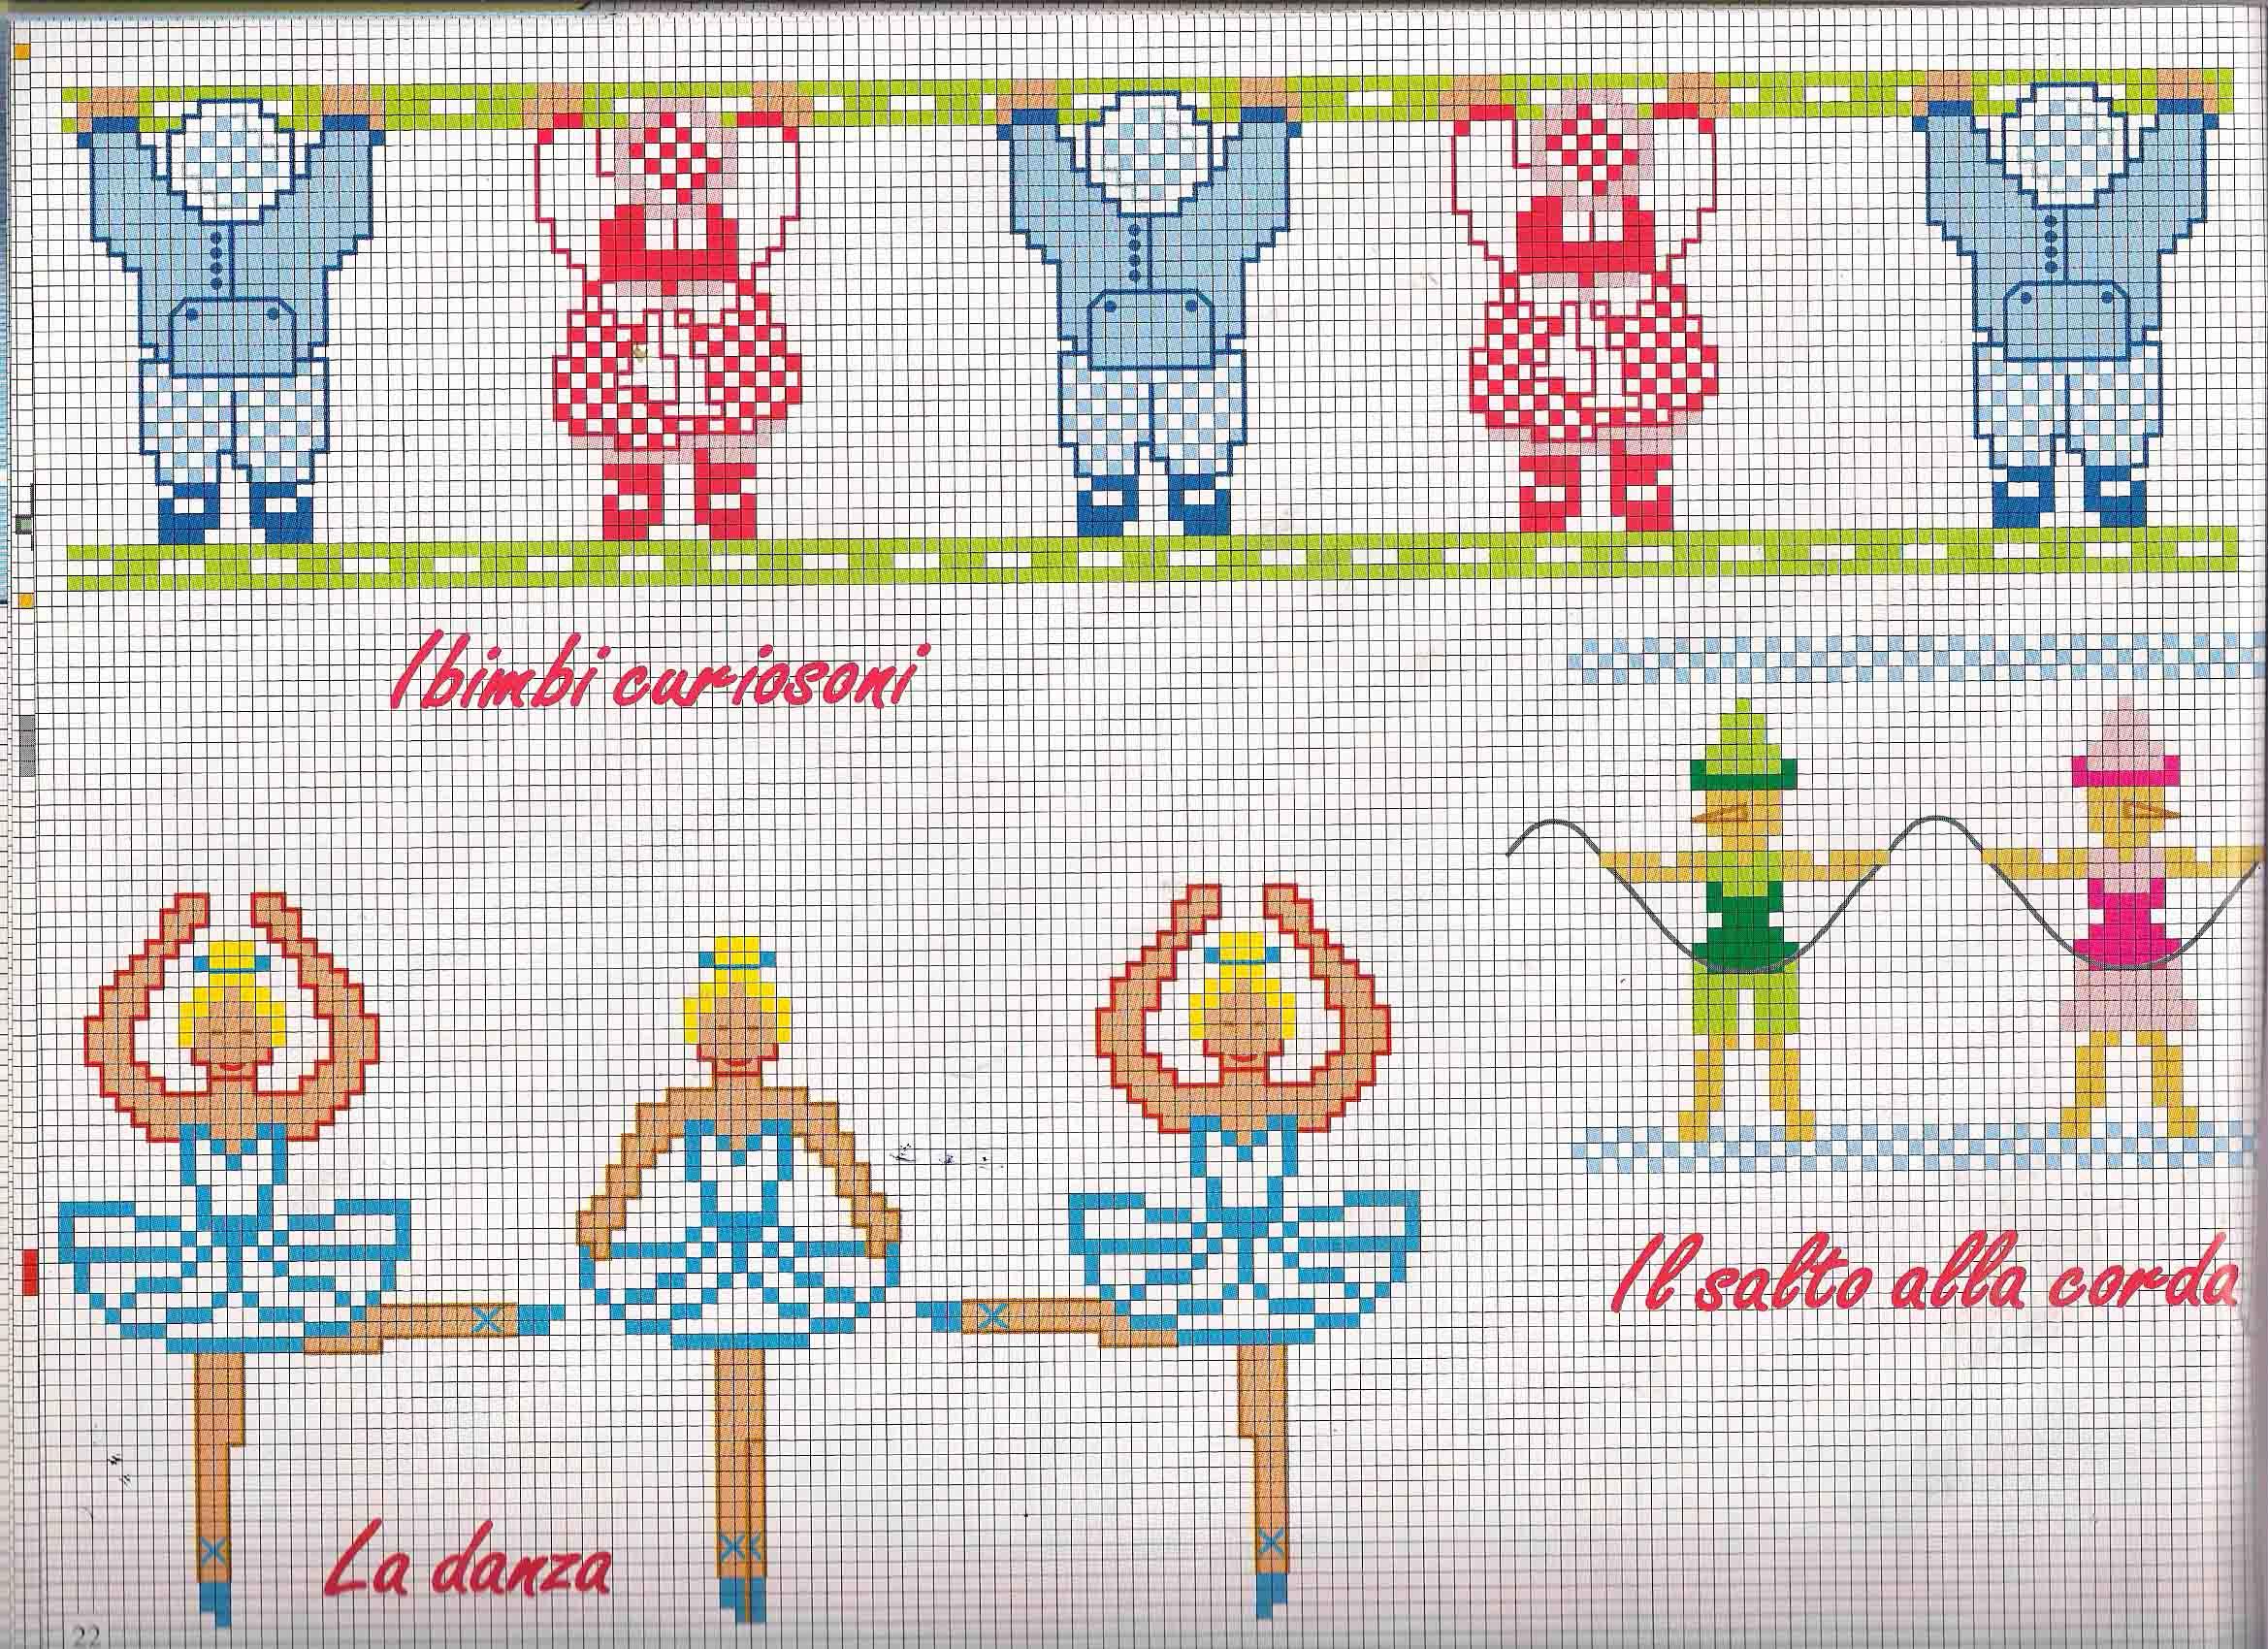 Bordi punto croce bimbi con ballerine for Punto croce bimbi schemi